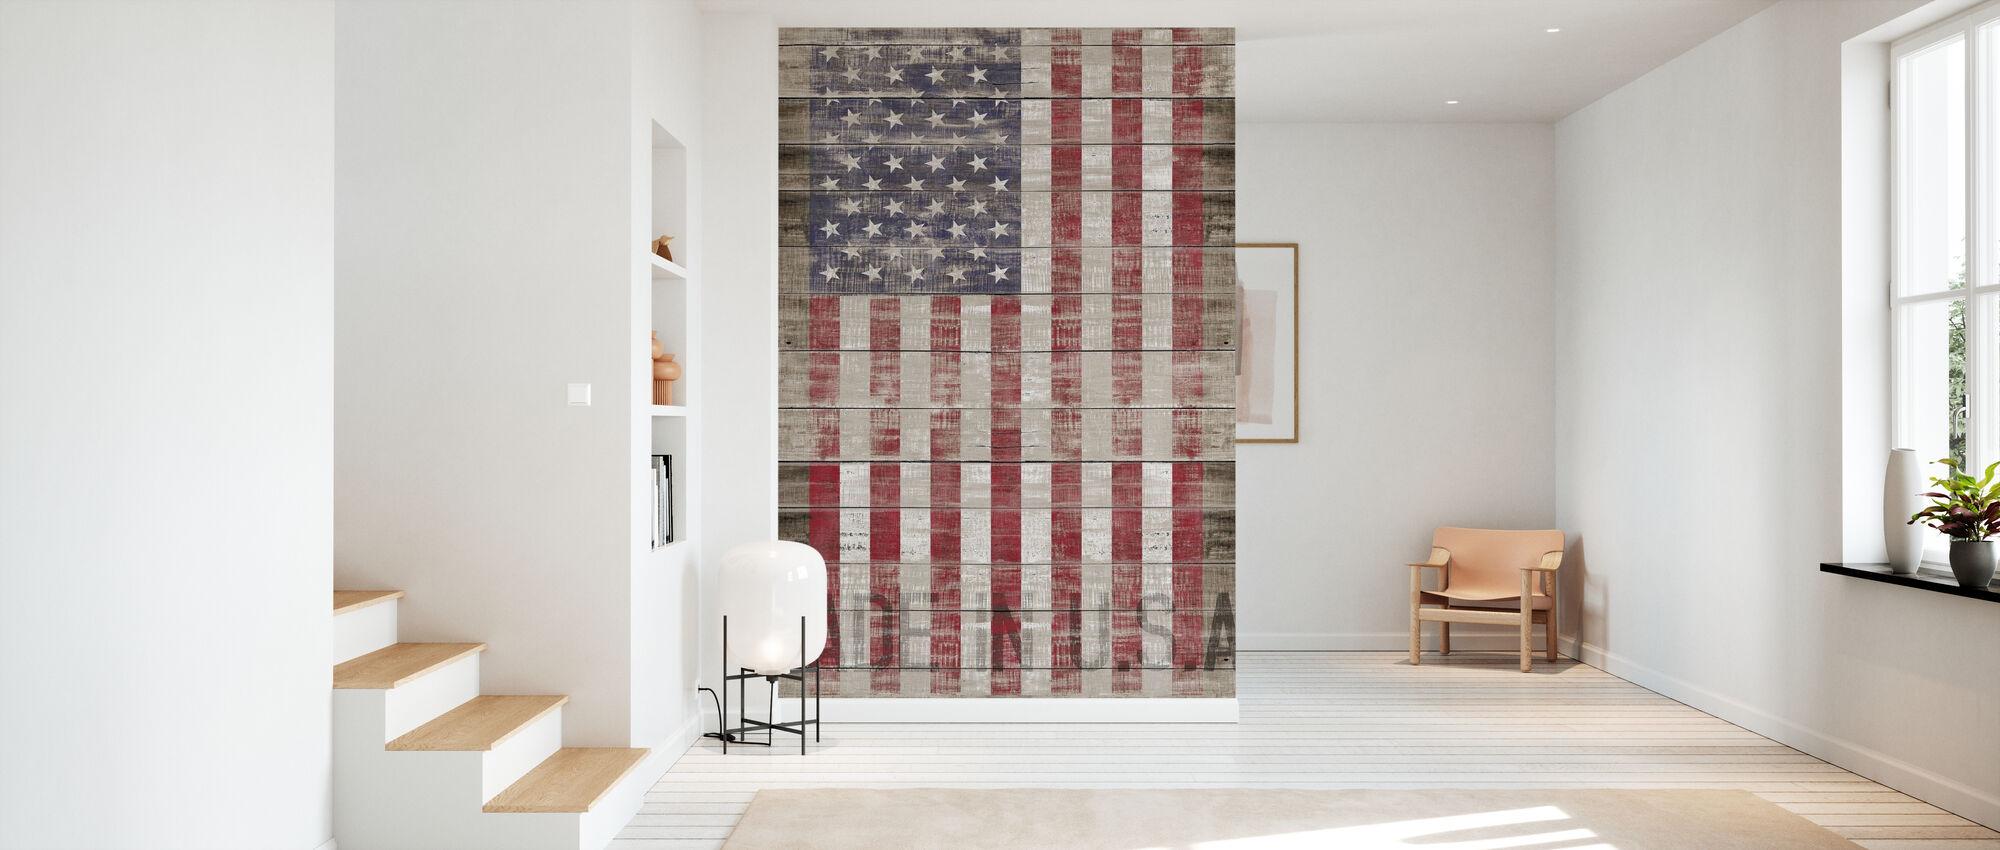 Amerikanische Flagge - Tapete - Flur